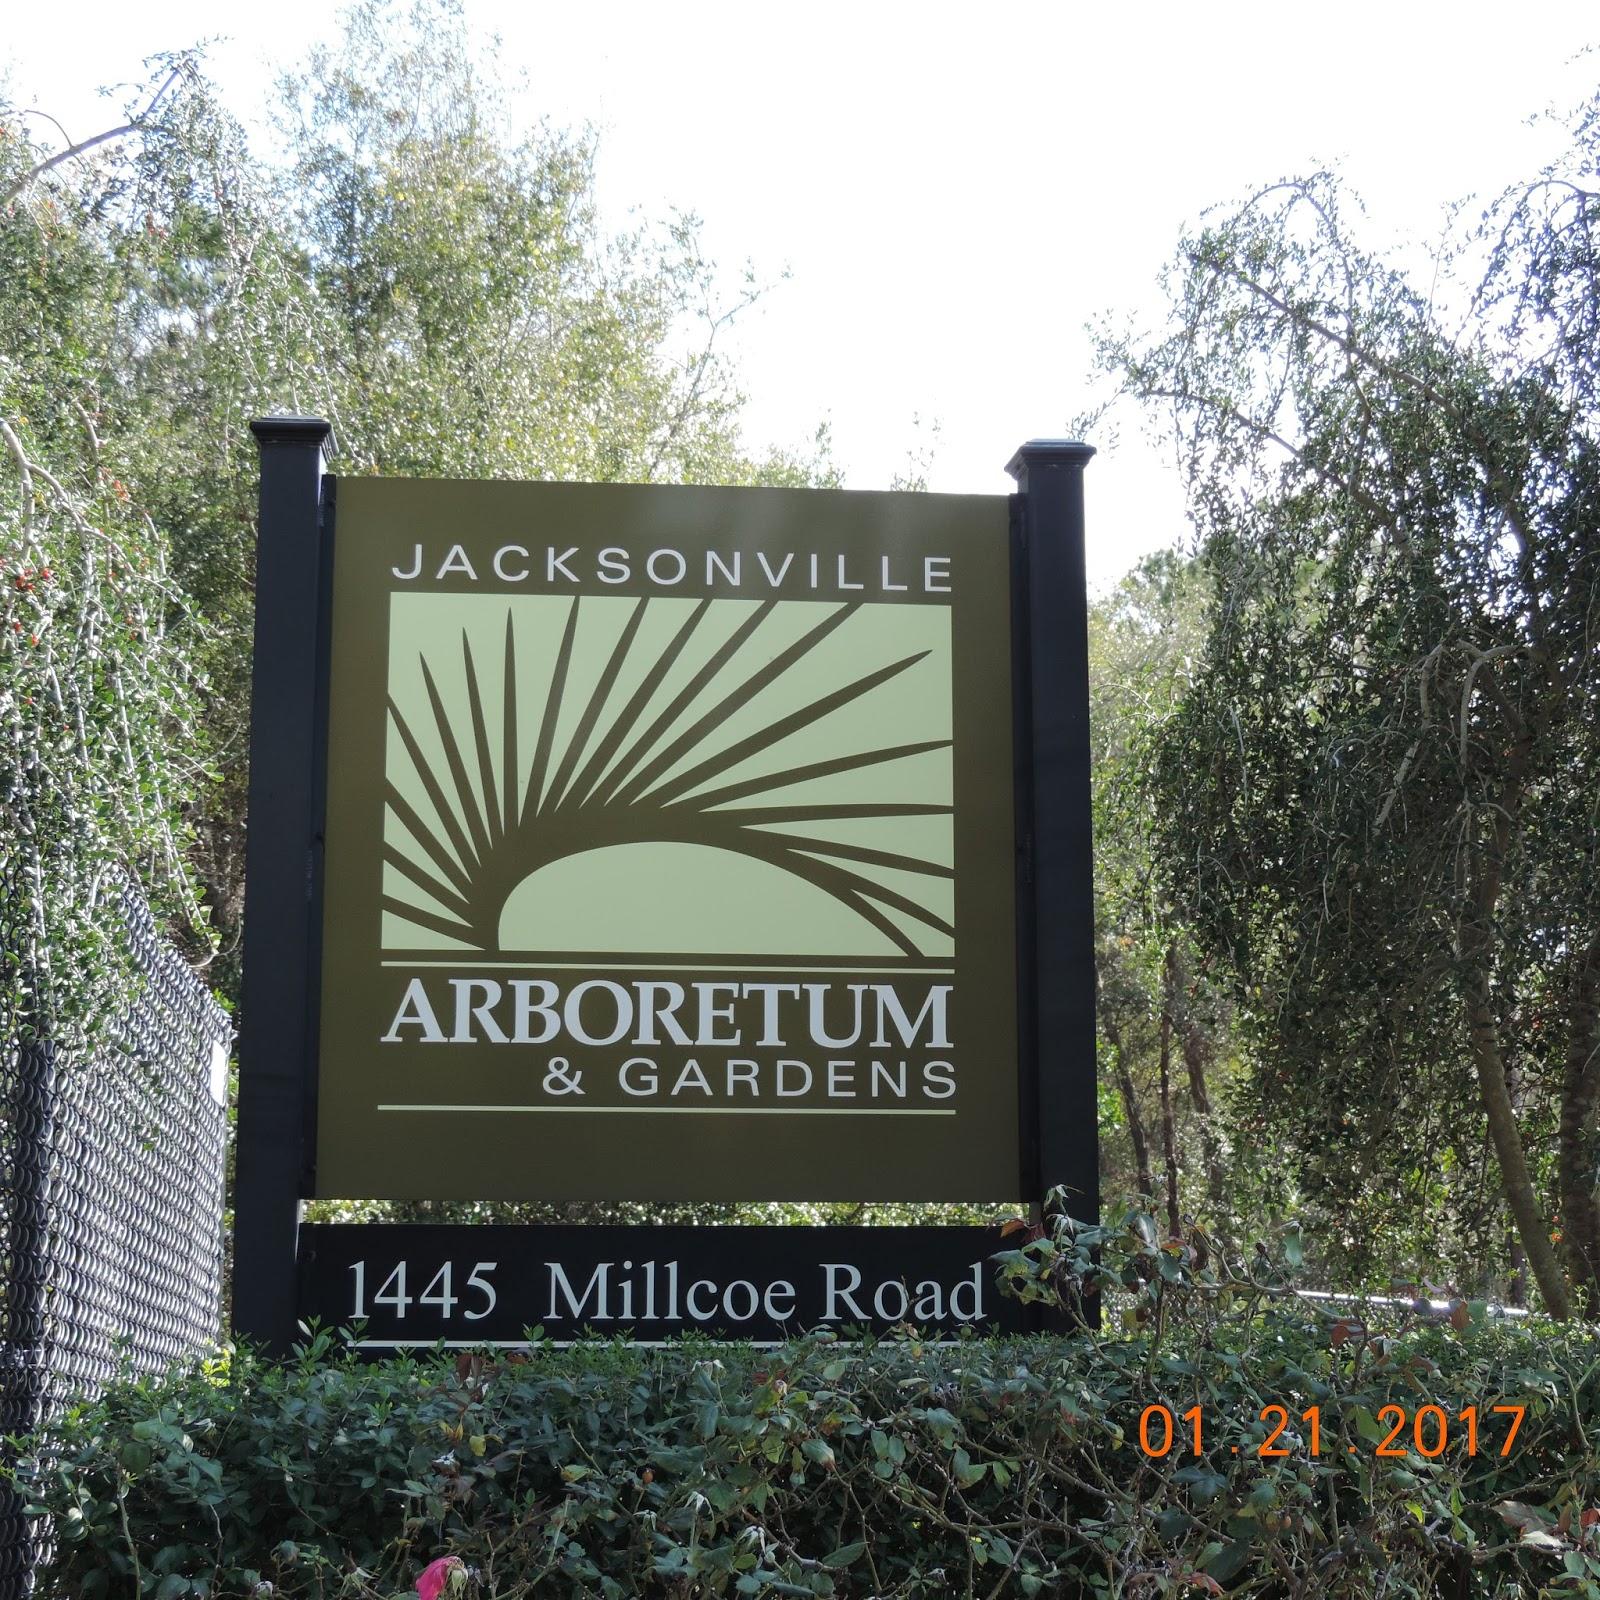 Faith family food and dogs jacksonville arboretum - Jacksonville arboretum gardens ...